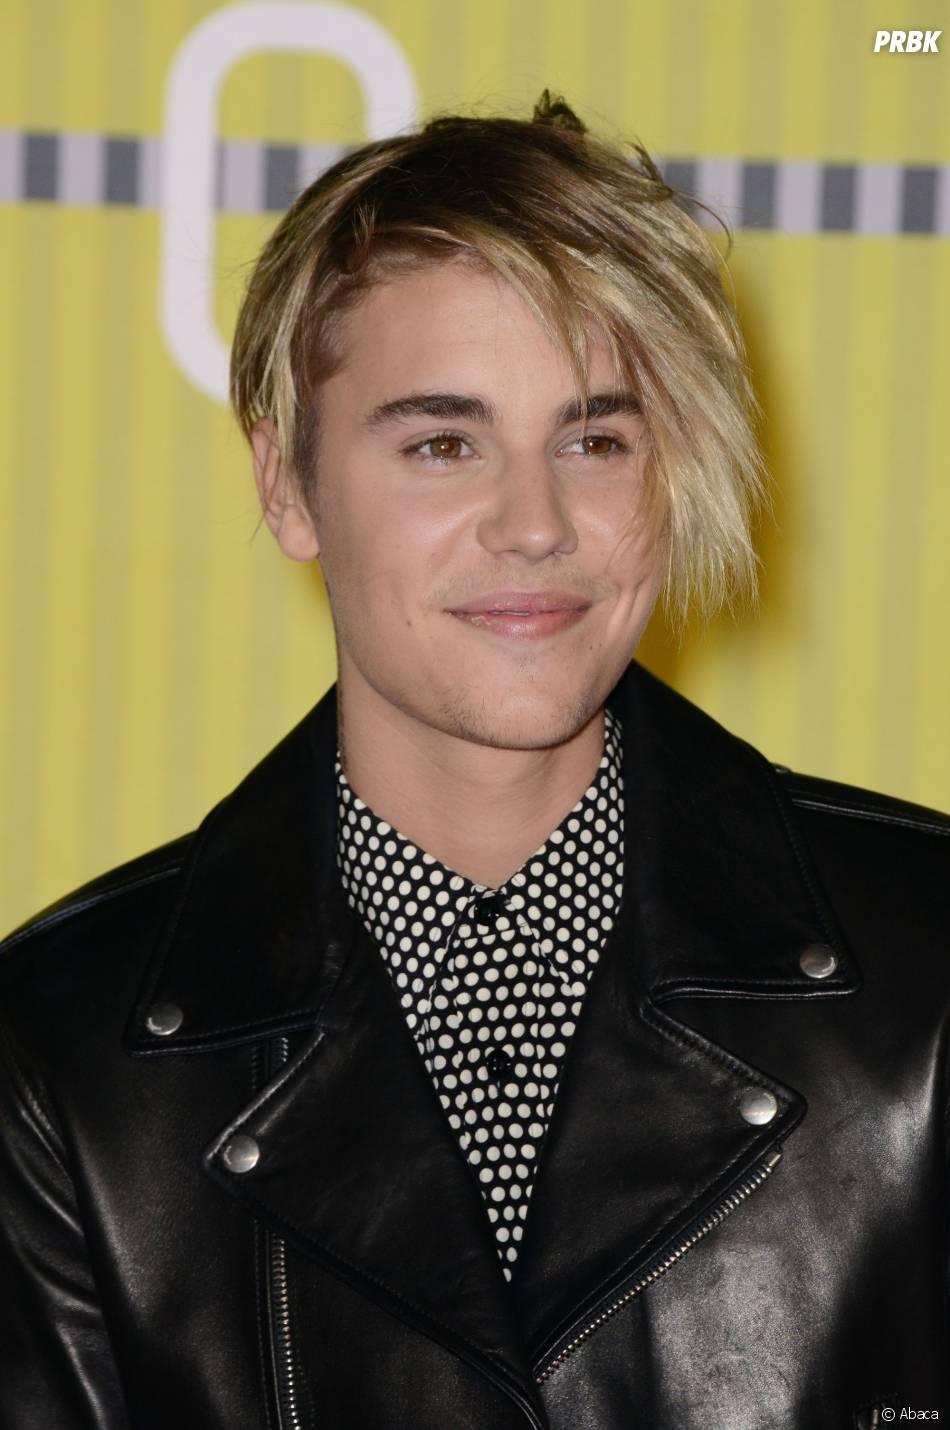 Justin Bieber sur le tapis rouge des MTV Video Music Awards 2015